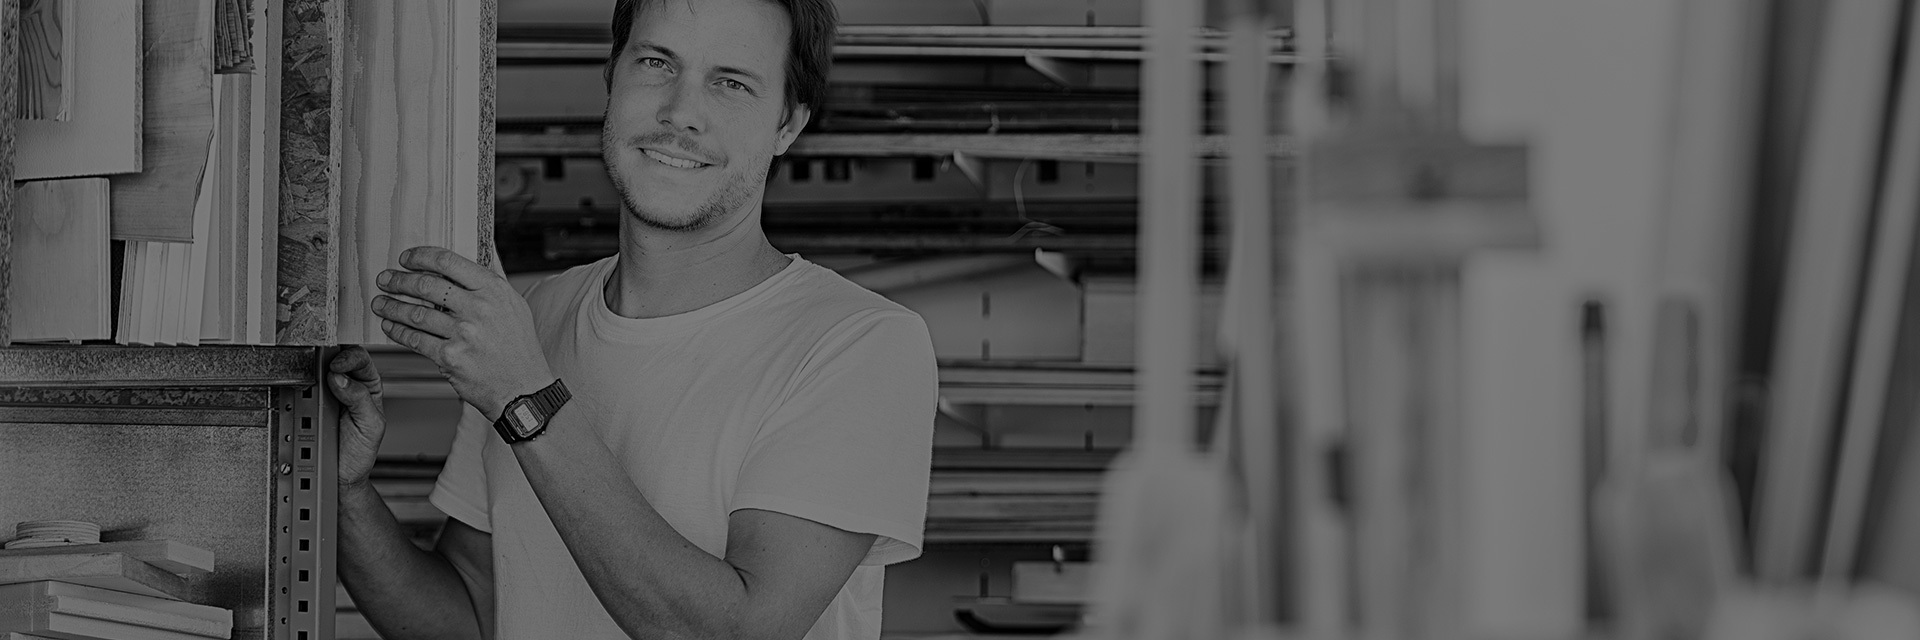 "Studio Inma Bermúdez,由一对幸福夫妻共同经营。2007年,由Inma Bermúdez于西班牙瓦伦西亚建立,2009年,Moritz Krefter加入。 来自西班牙的Inma,毕业于瓦伦西亚埃雷拉红衣主教大学工业设计专业,擅长于产品的外观设计,比例把握及材料结合;Moritz来自德国,毕业于魏玛包豪斯大学建筑专业,他的加入,互补了工作室在技术知识方面的空缺。不同的专业及文化背景,使得他们相互互补得更加完美。""最重要的是我们很享受一起工作的时光,这一切都直接影响着我们的设计创作。"""